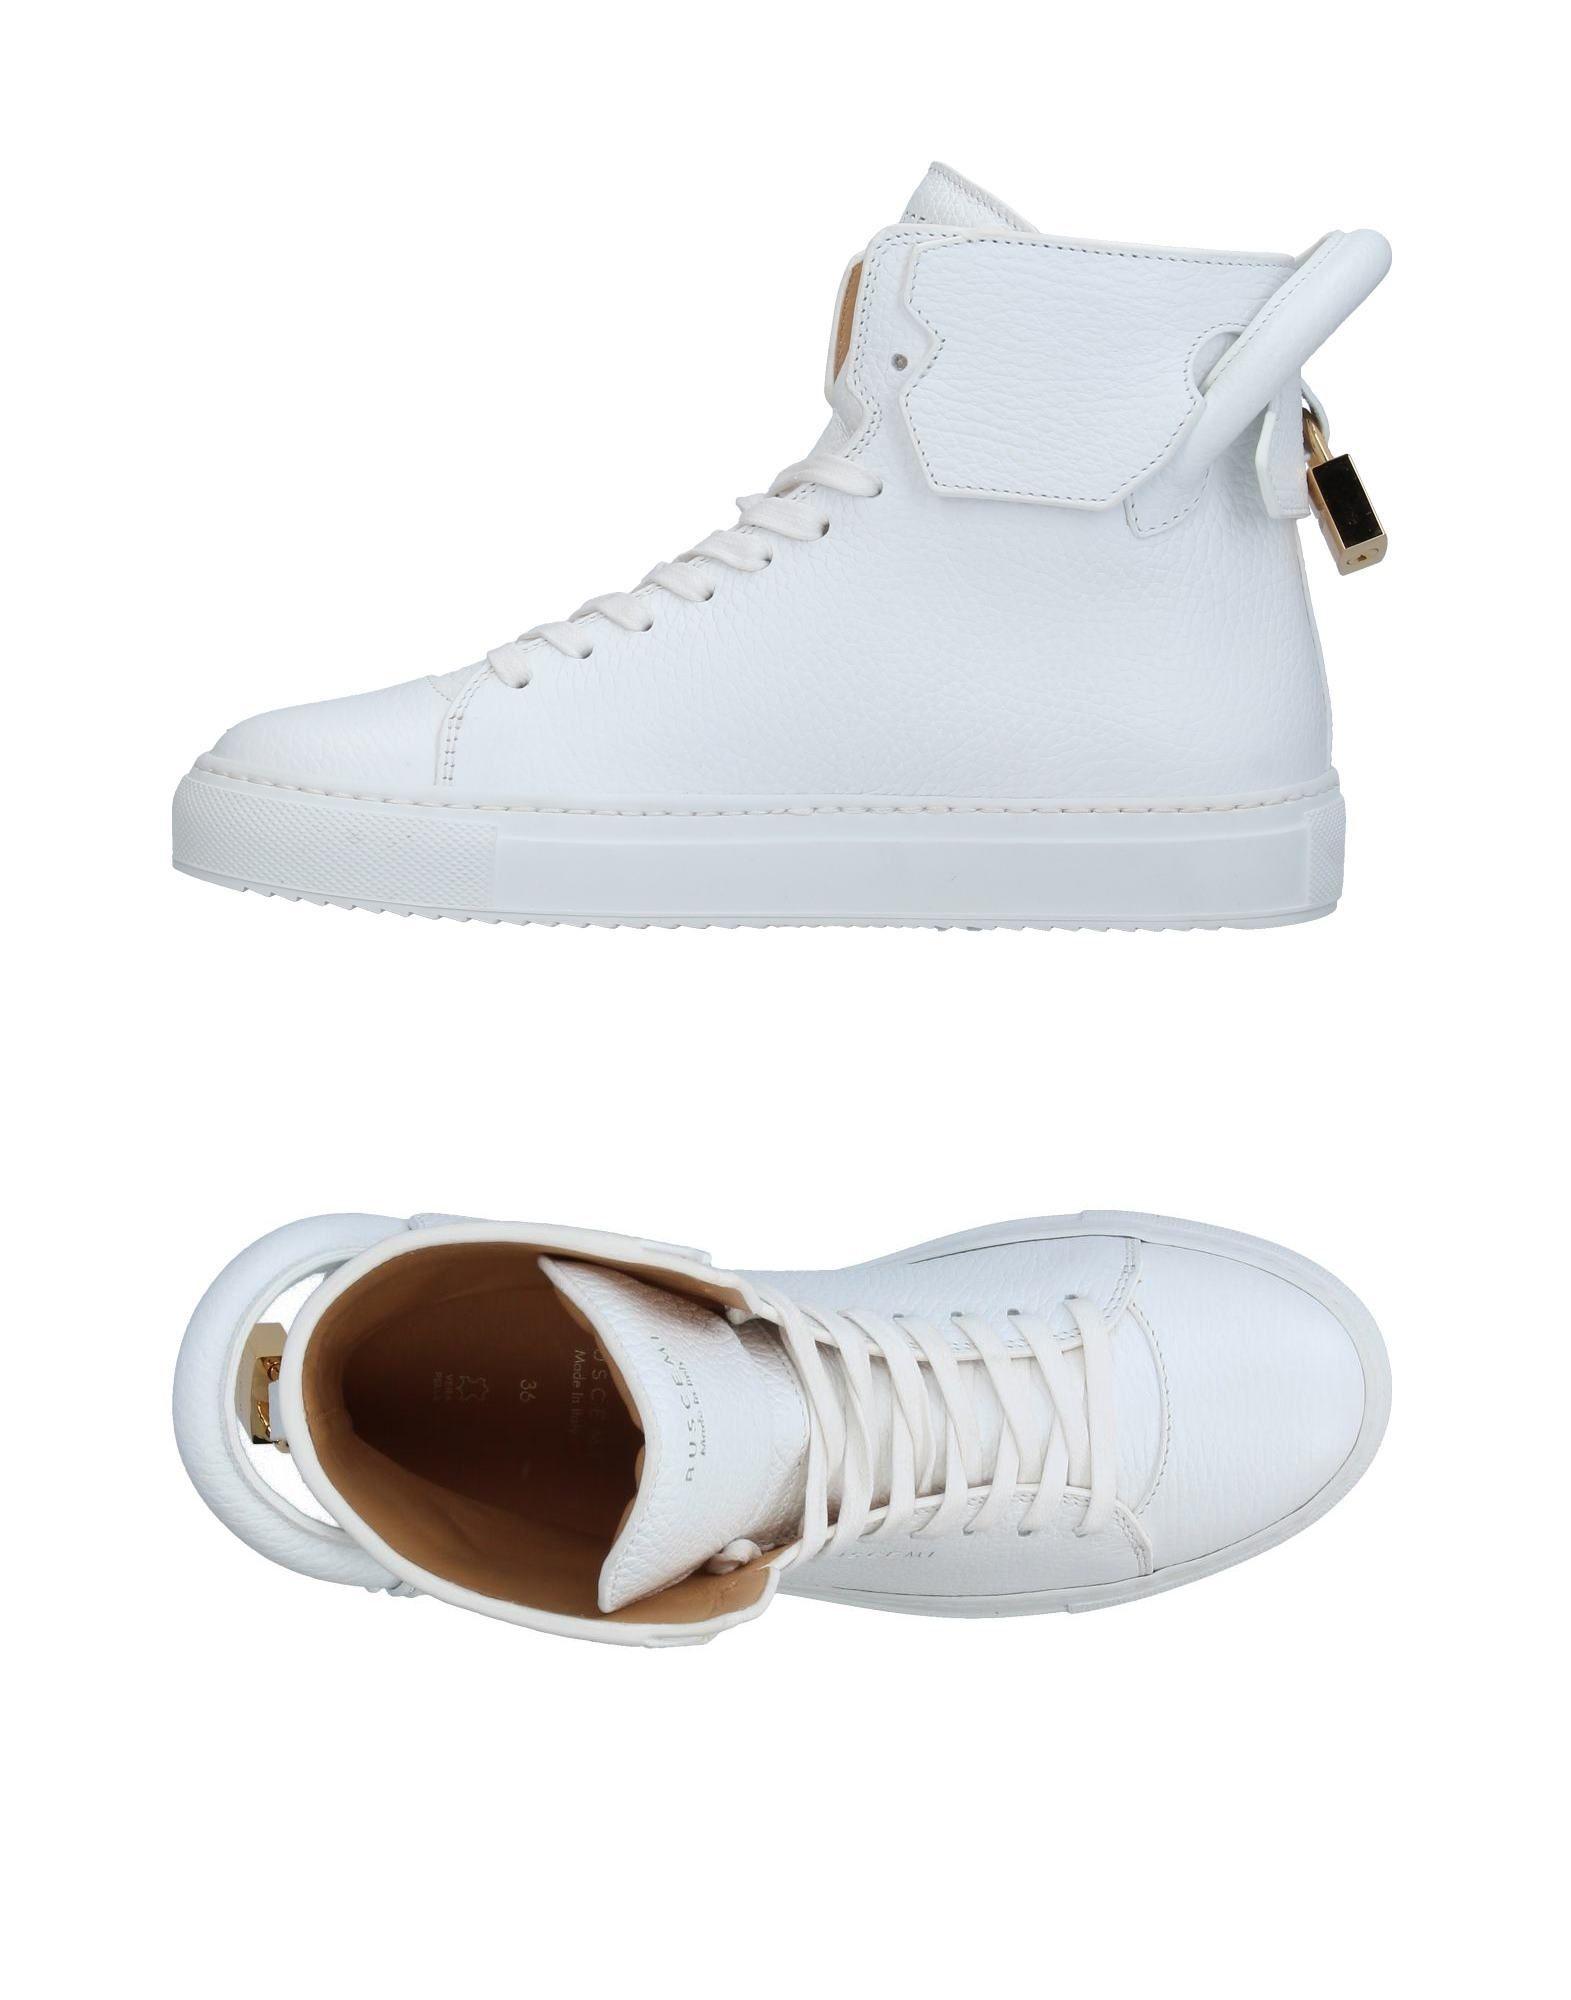 Buscemi Sneakers Damen  11340230GIGünstige Schuhe gut aussehende Schuhe 11340230GIGünstige 28e66f